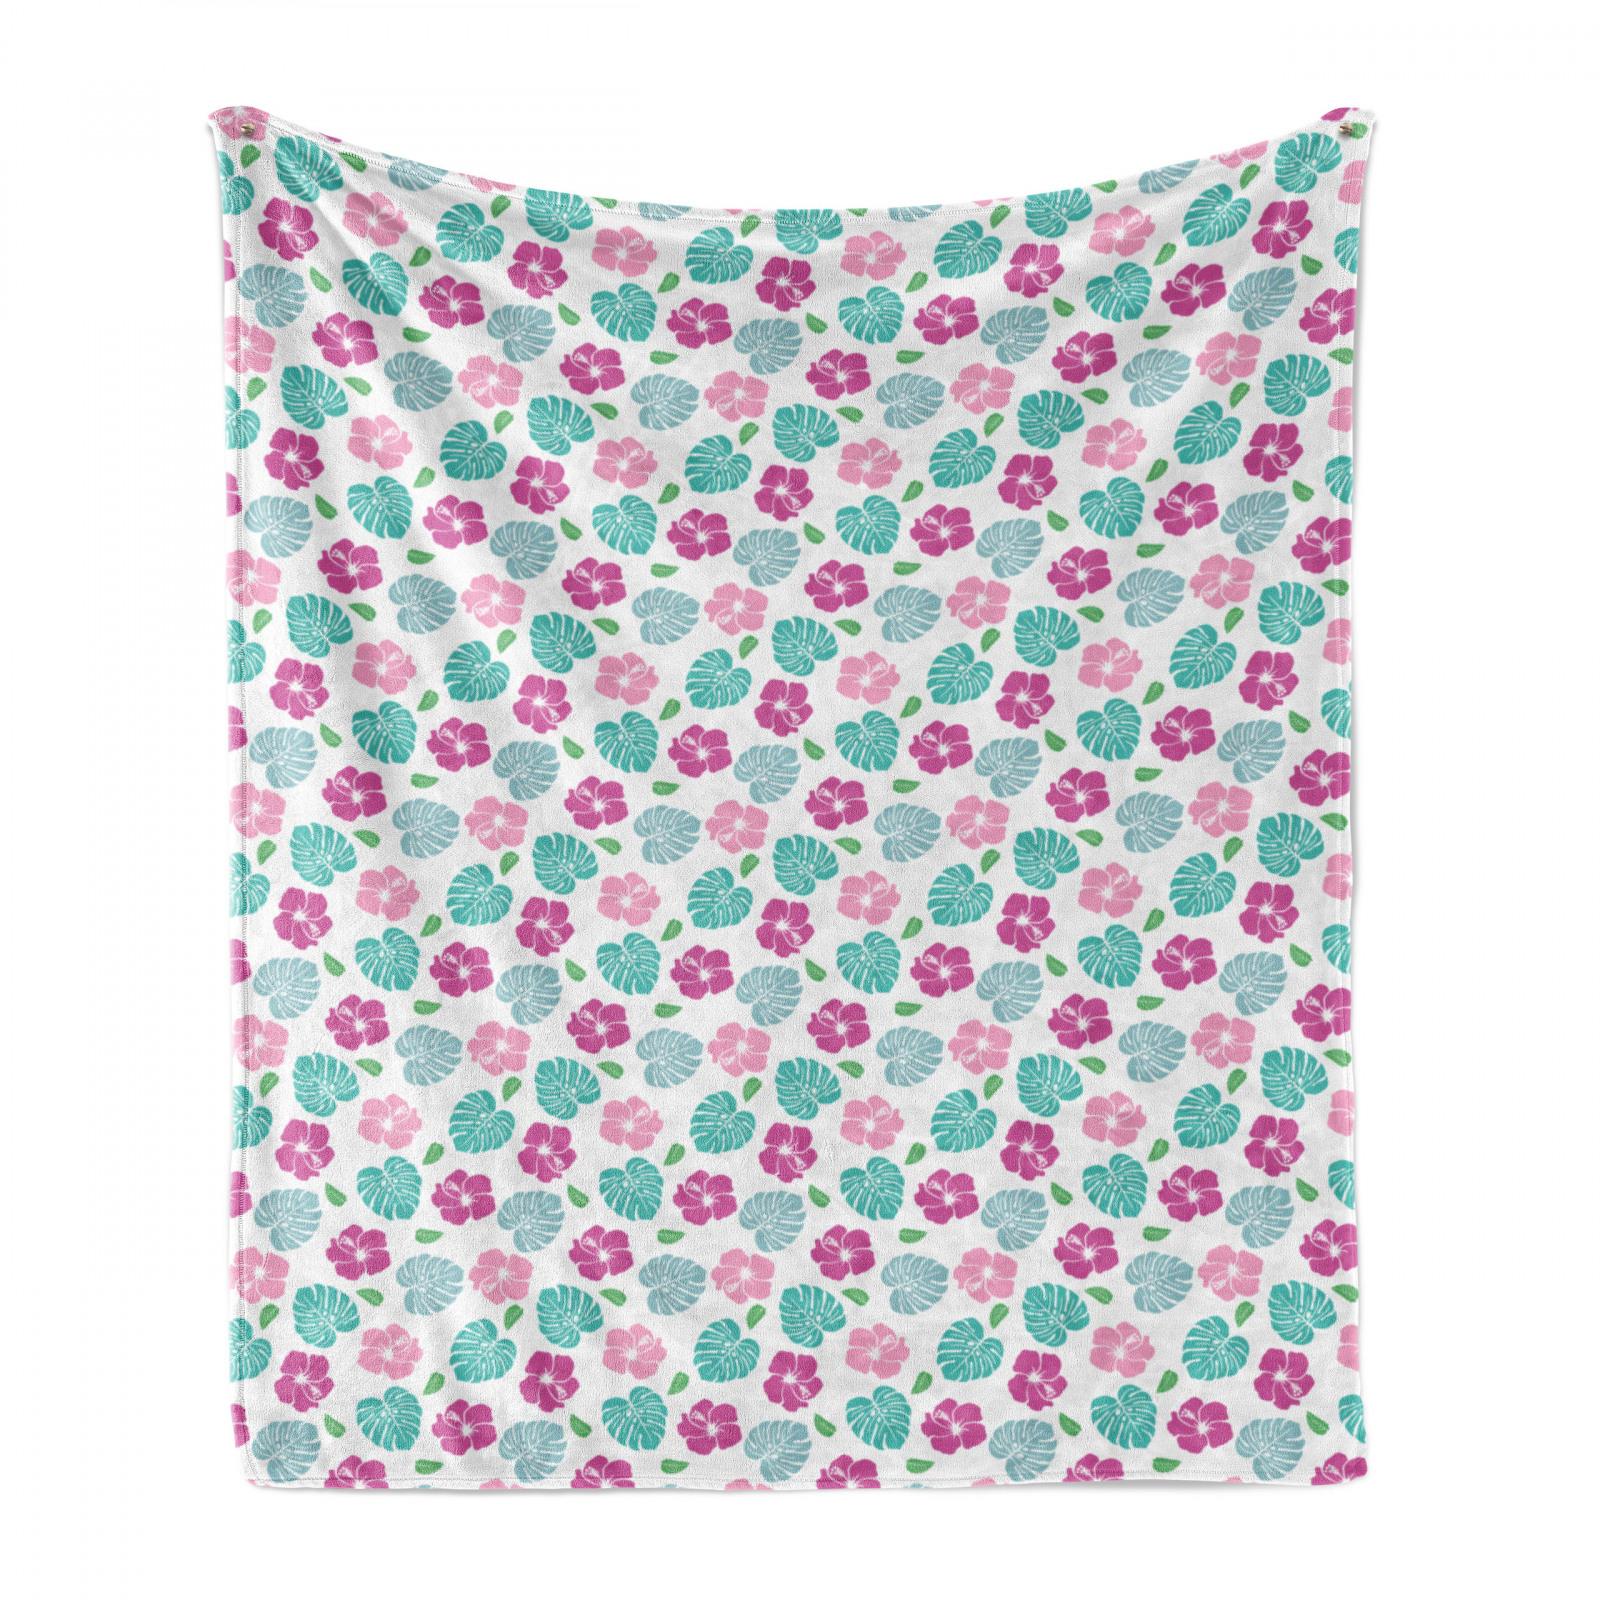 Tropical Soft Flannel Fleece Blanket Flower Garden Art